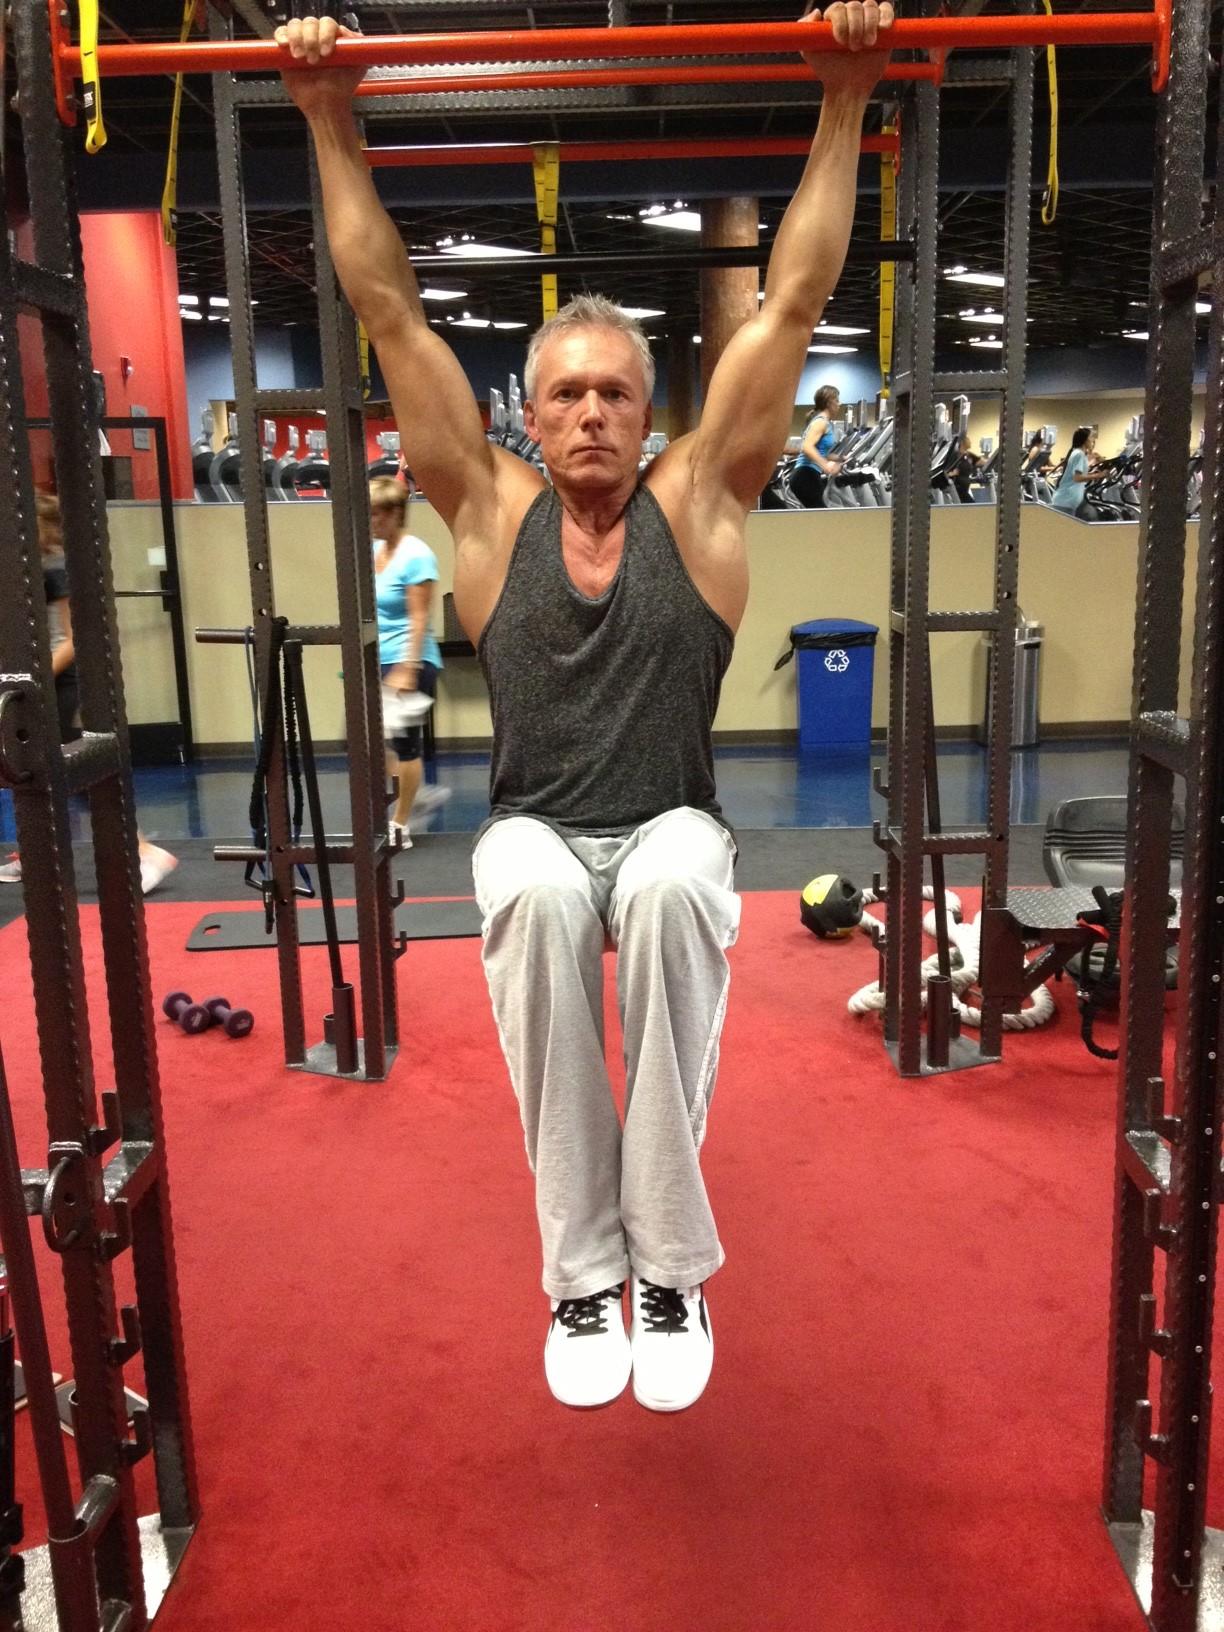 Hanging knee raises with medicine ball - Hanging Knee Raises